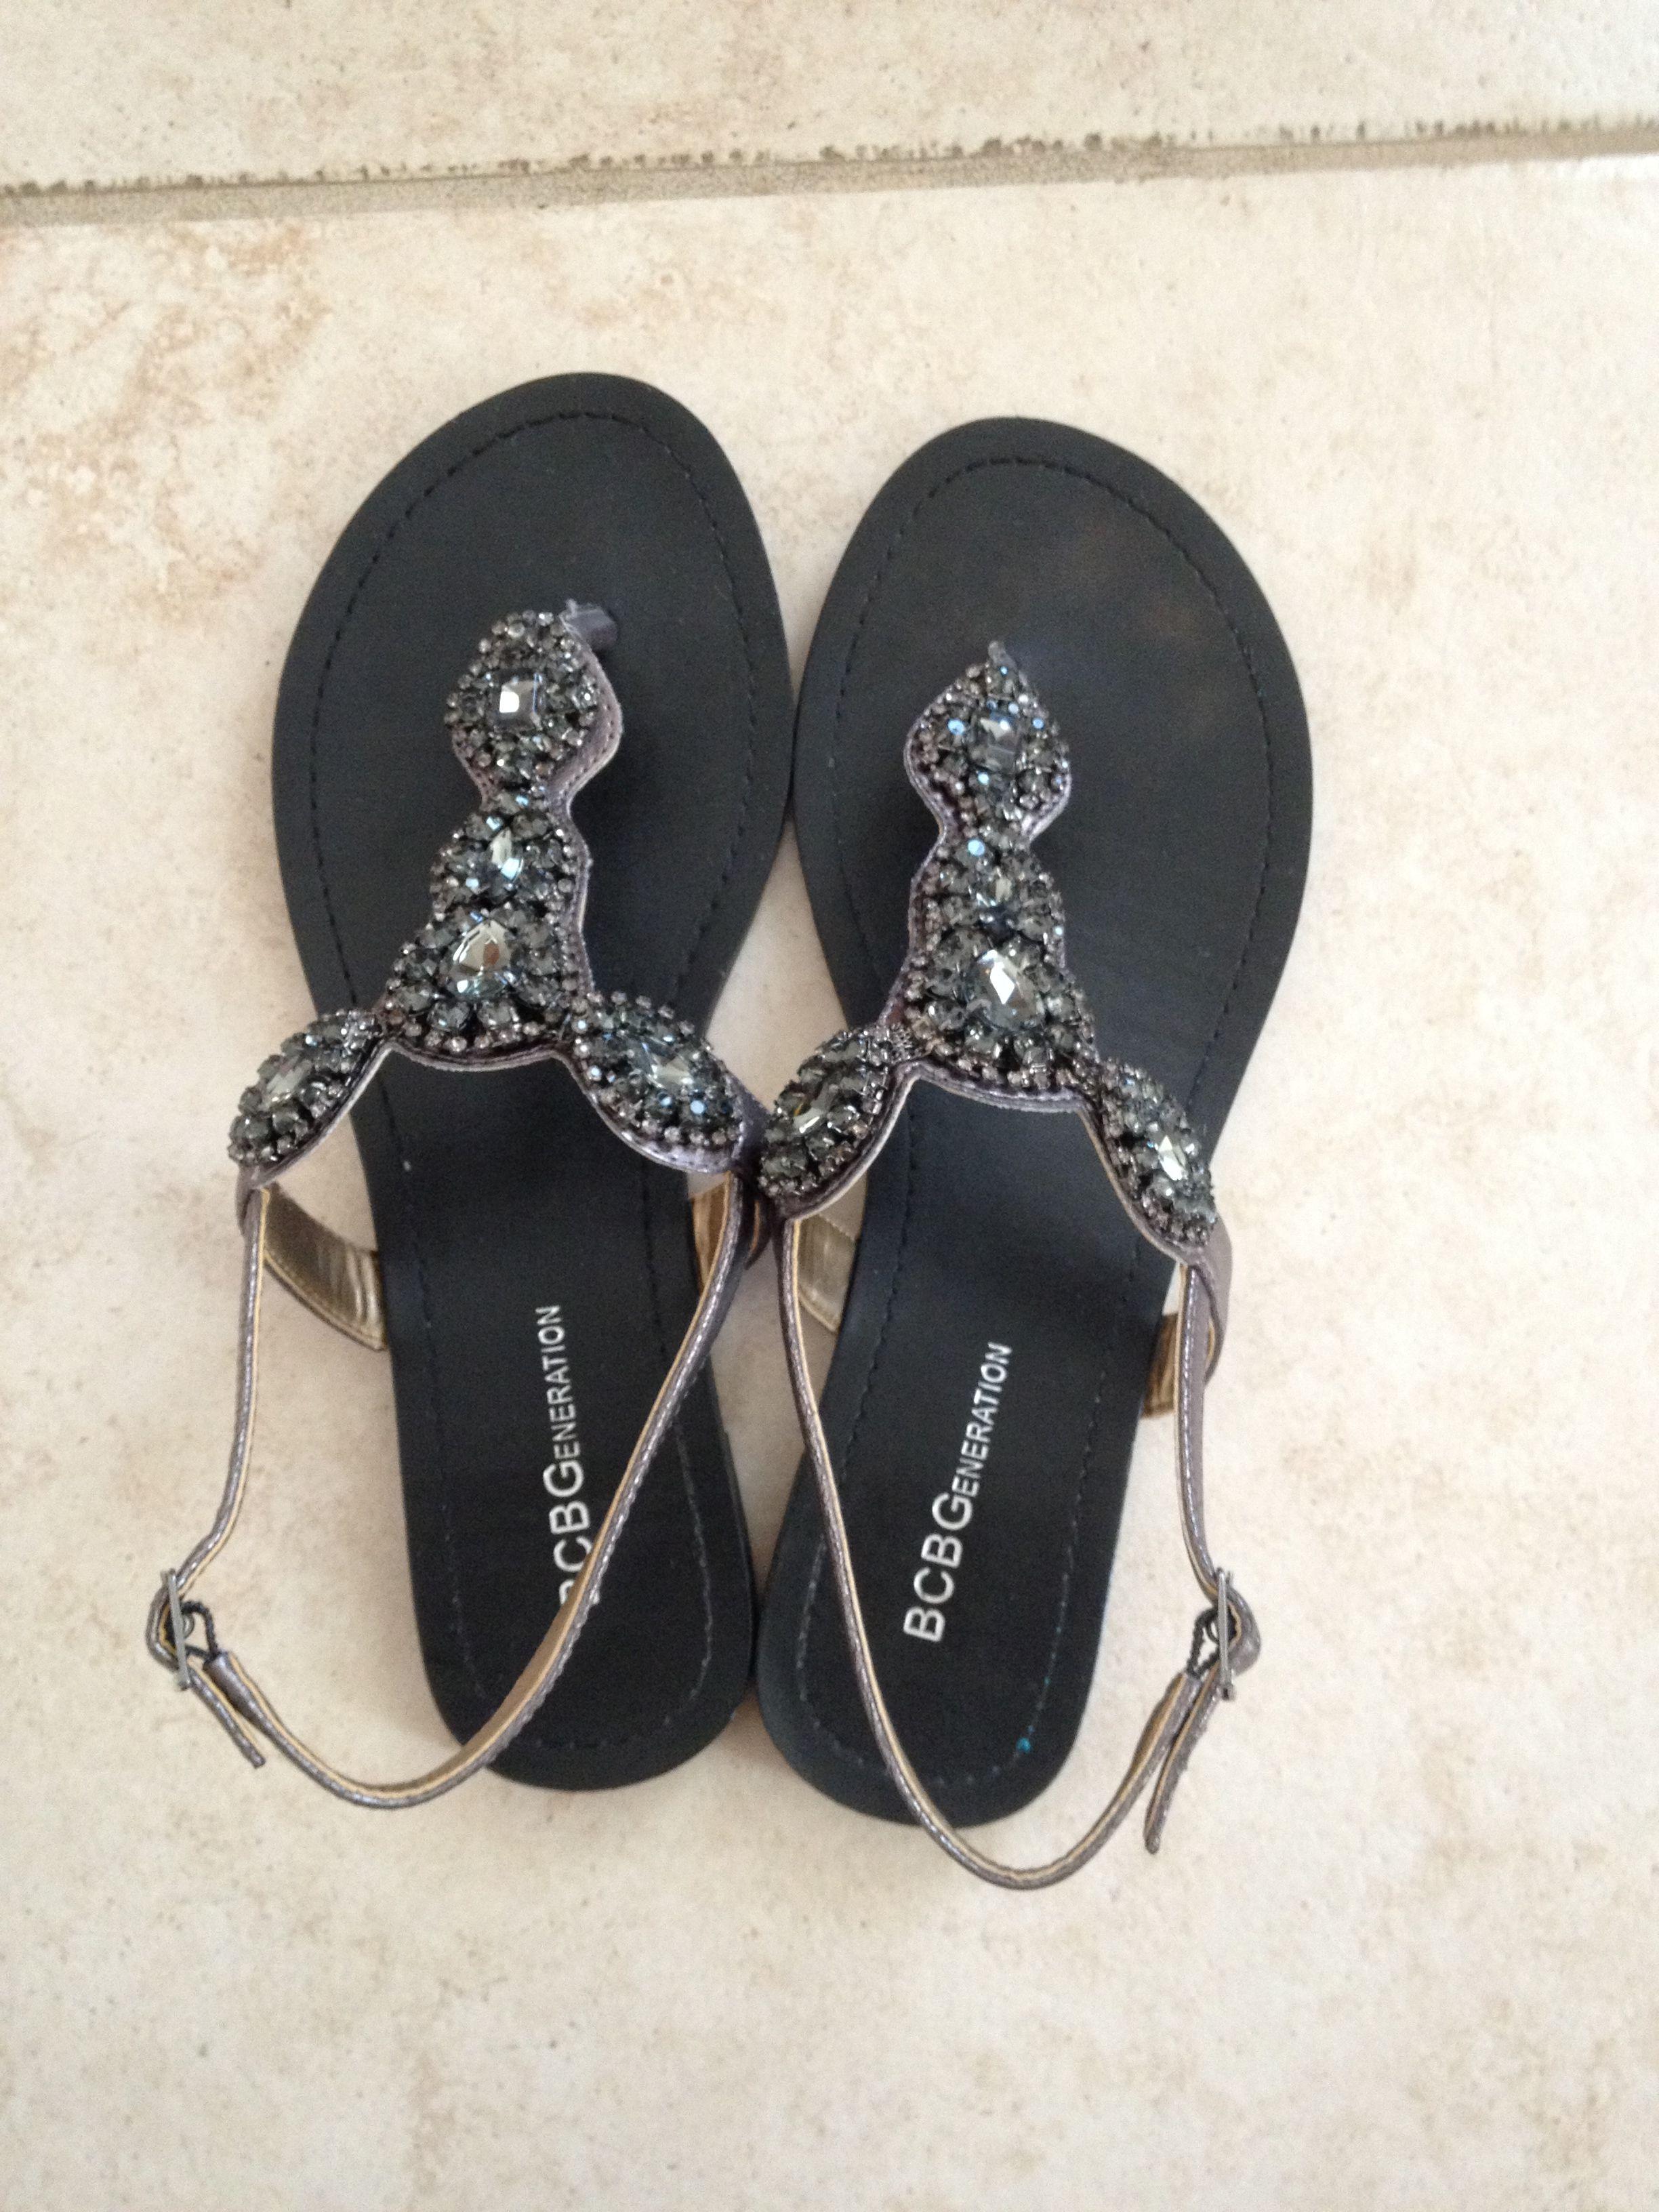 d96f23848d6e1 Graphite stones and black sole ... Glitz and glamour ... And all mine !!!  Lol